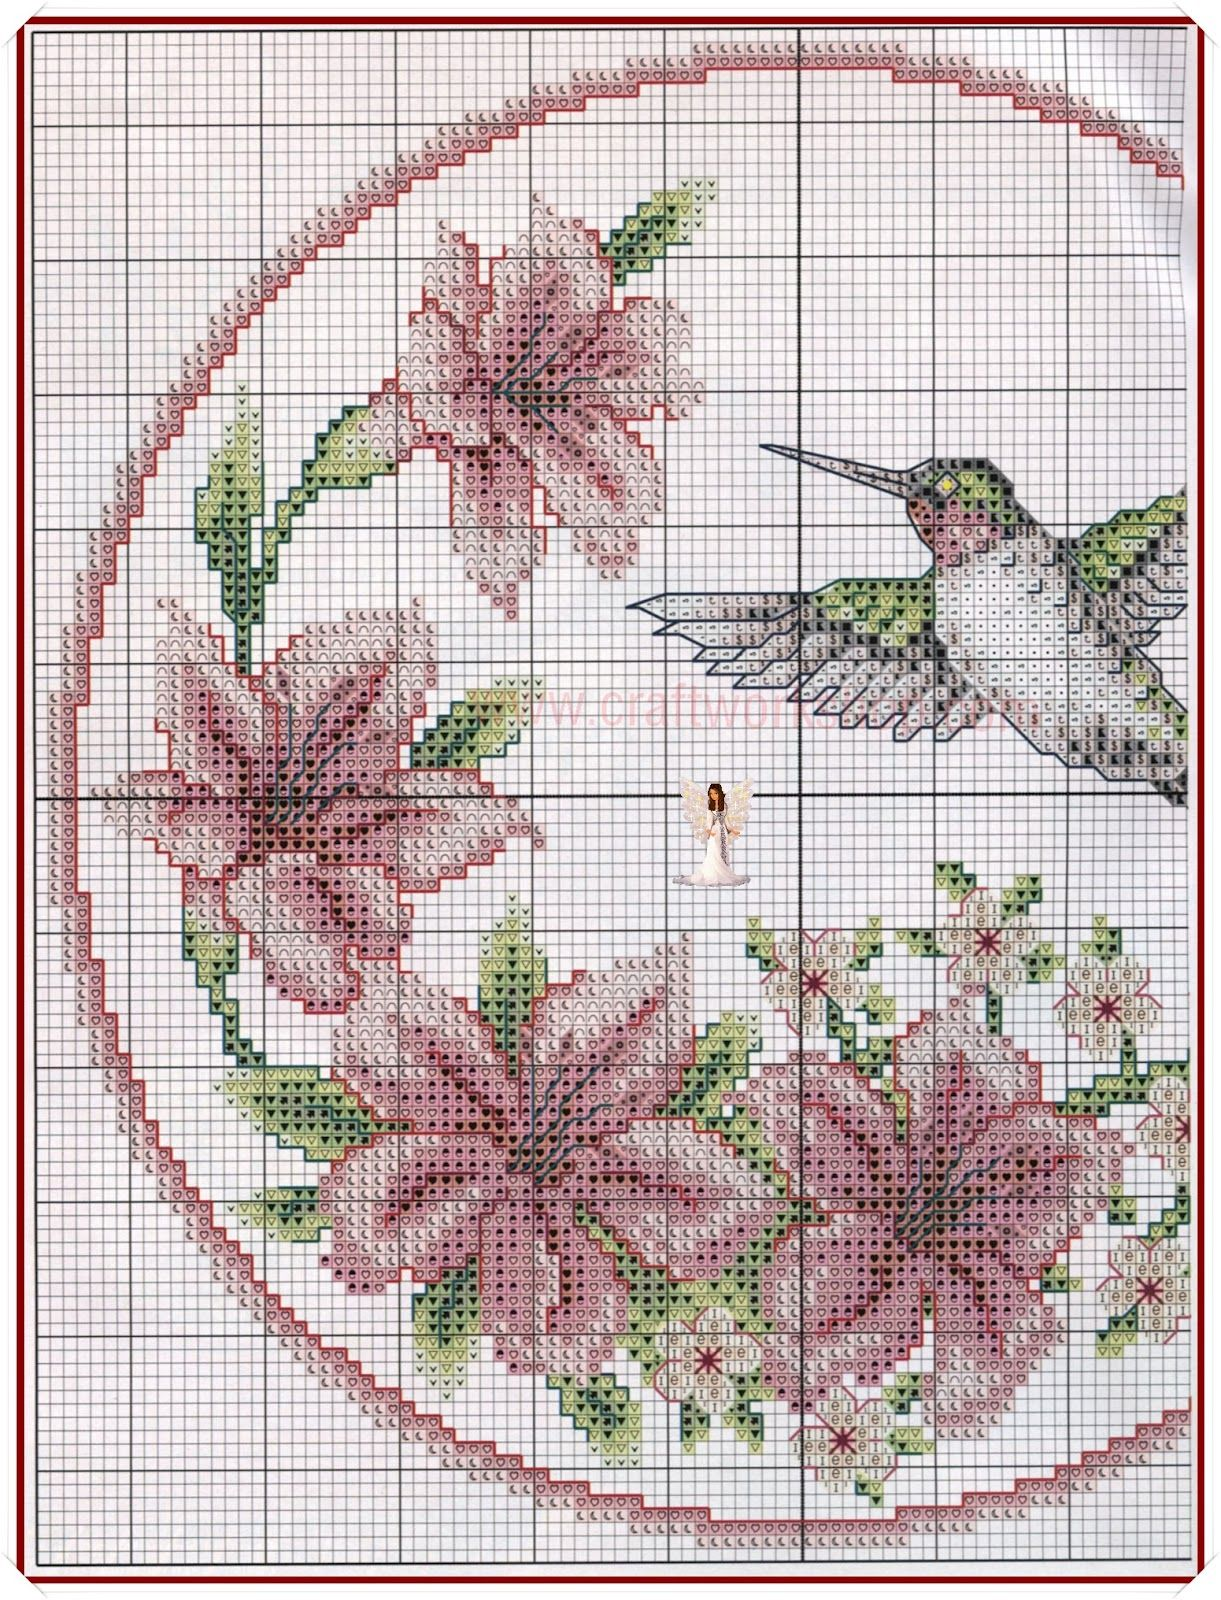 Lavores da Ana Paula: Aves